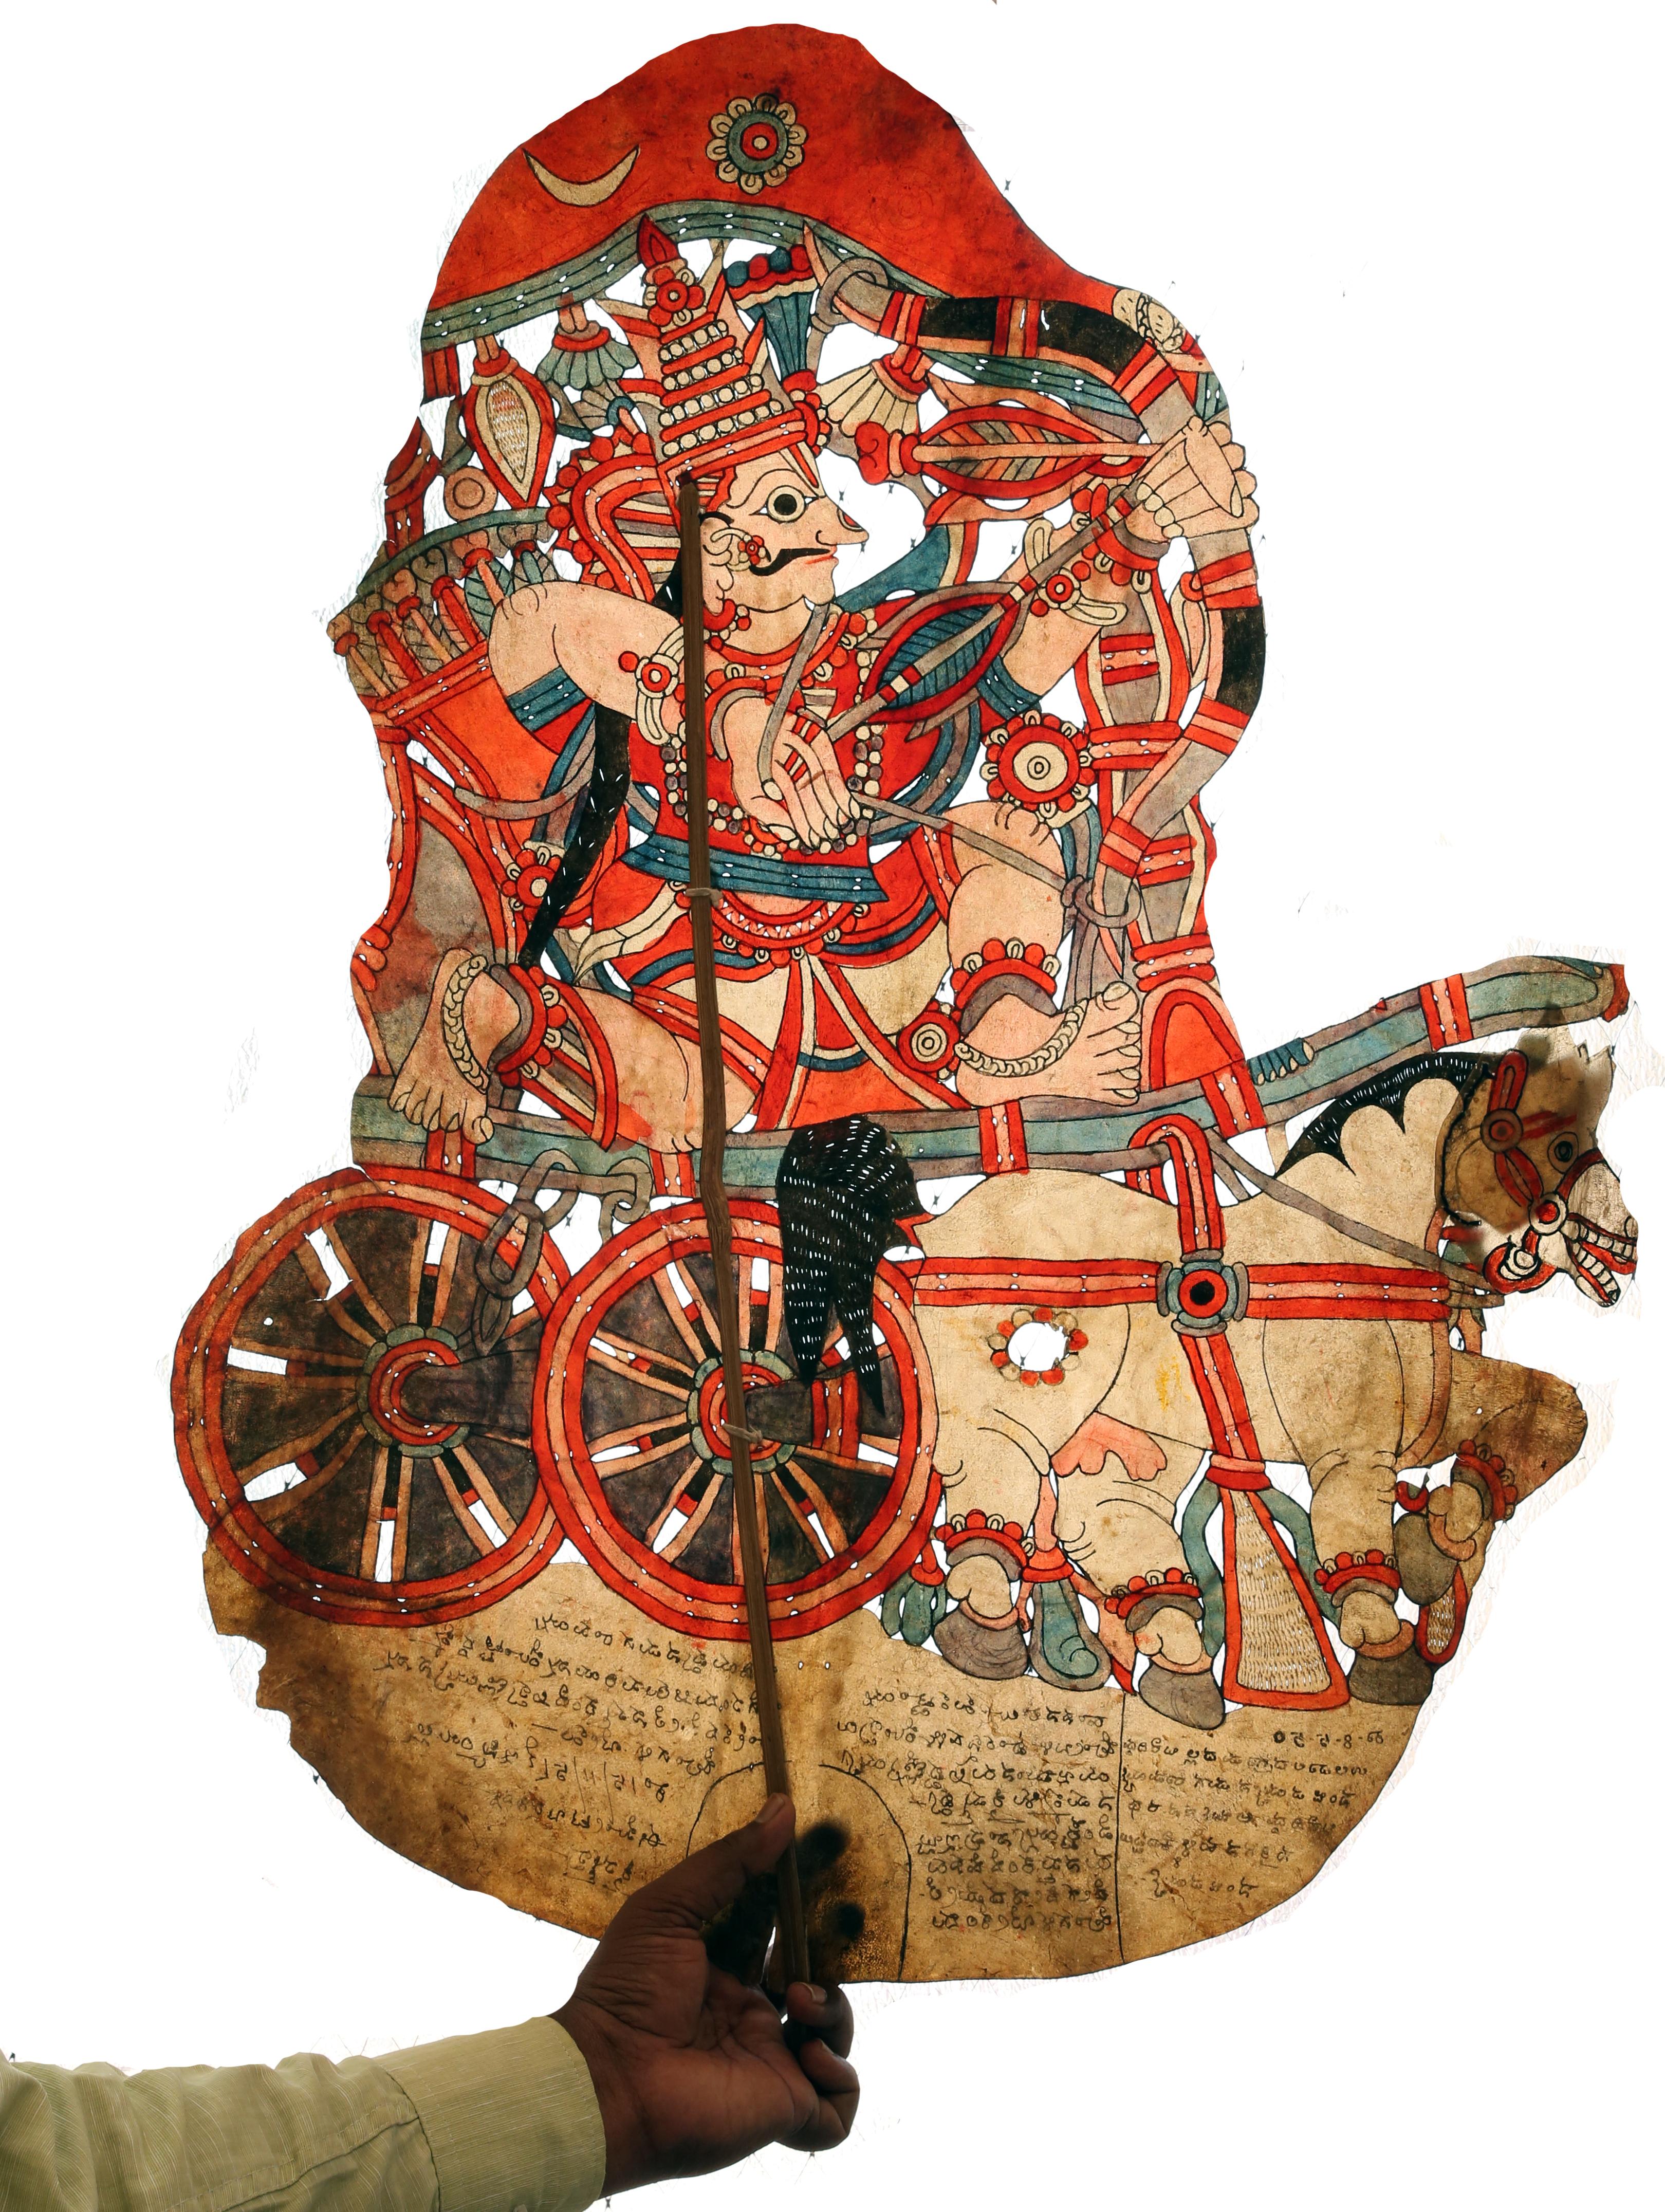 Arjuna dans son chariot, figure d'ombre créée par le marionnettiste, Gunduraju (Hassan, Karnataka). Togalu gombeyata, théâtre d'ombres de Karnataka, Inde